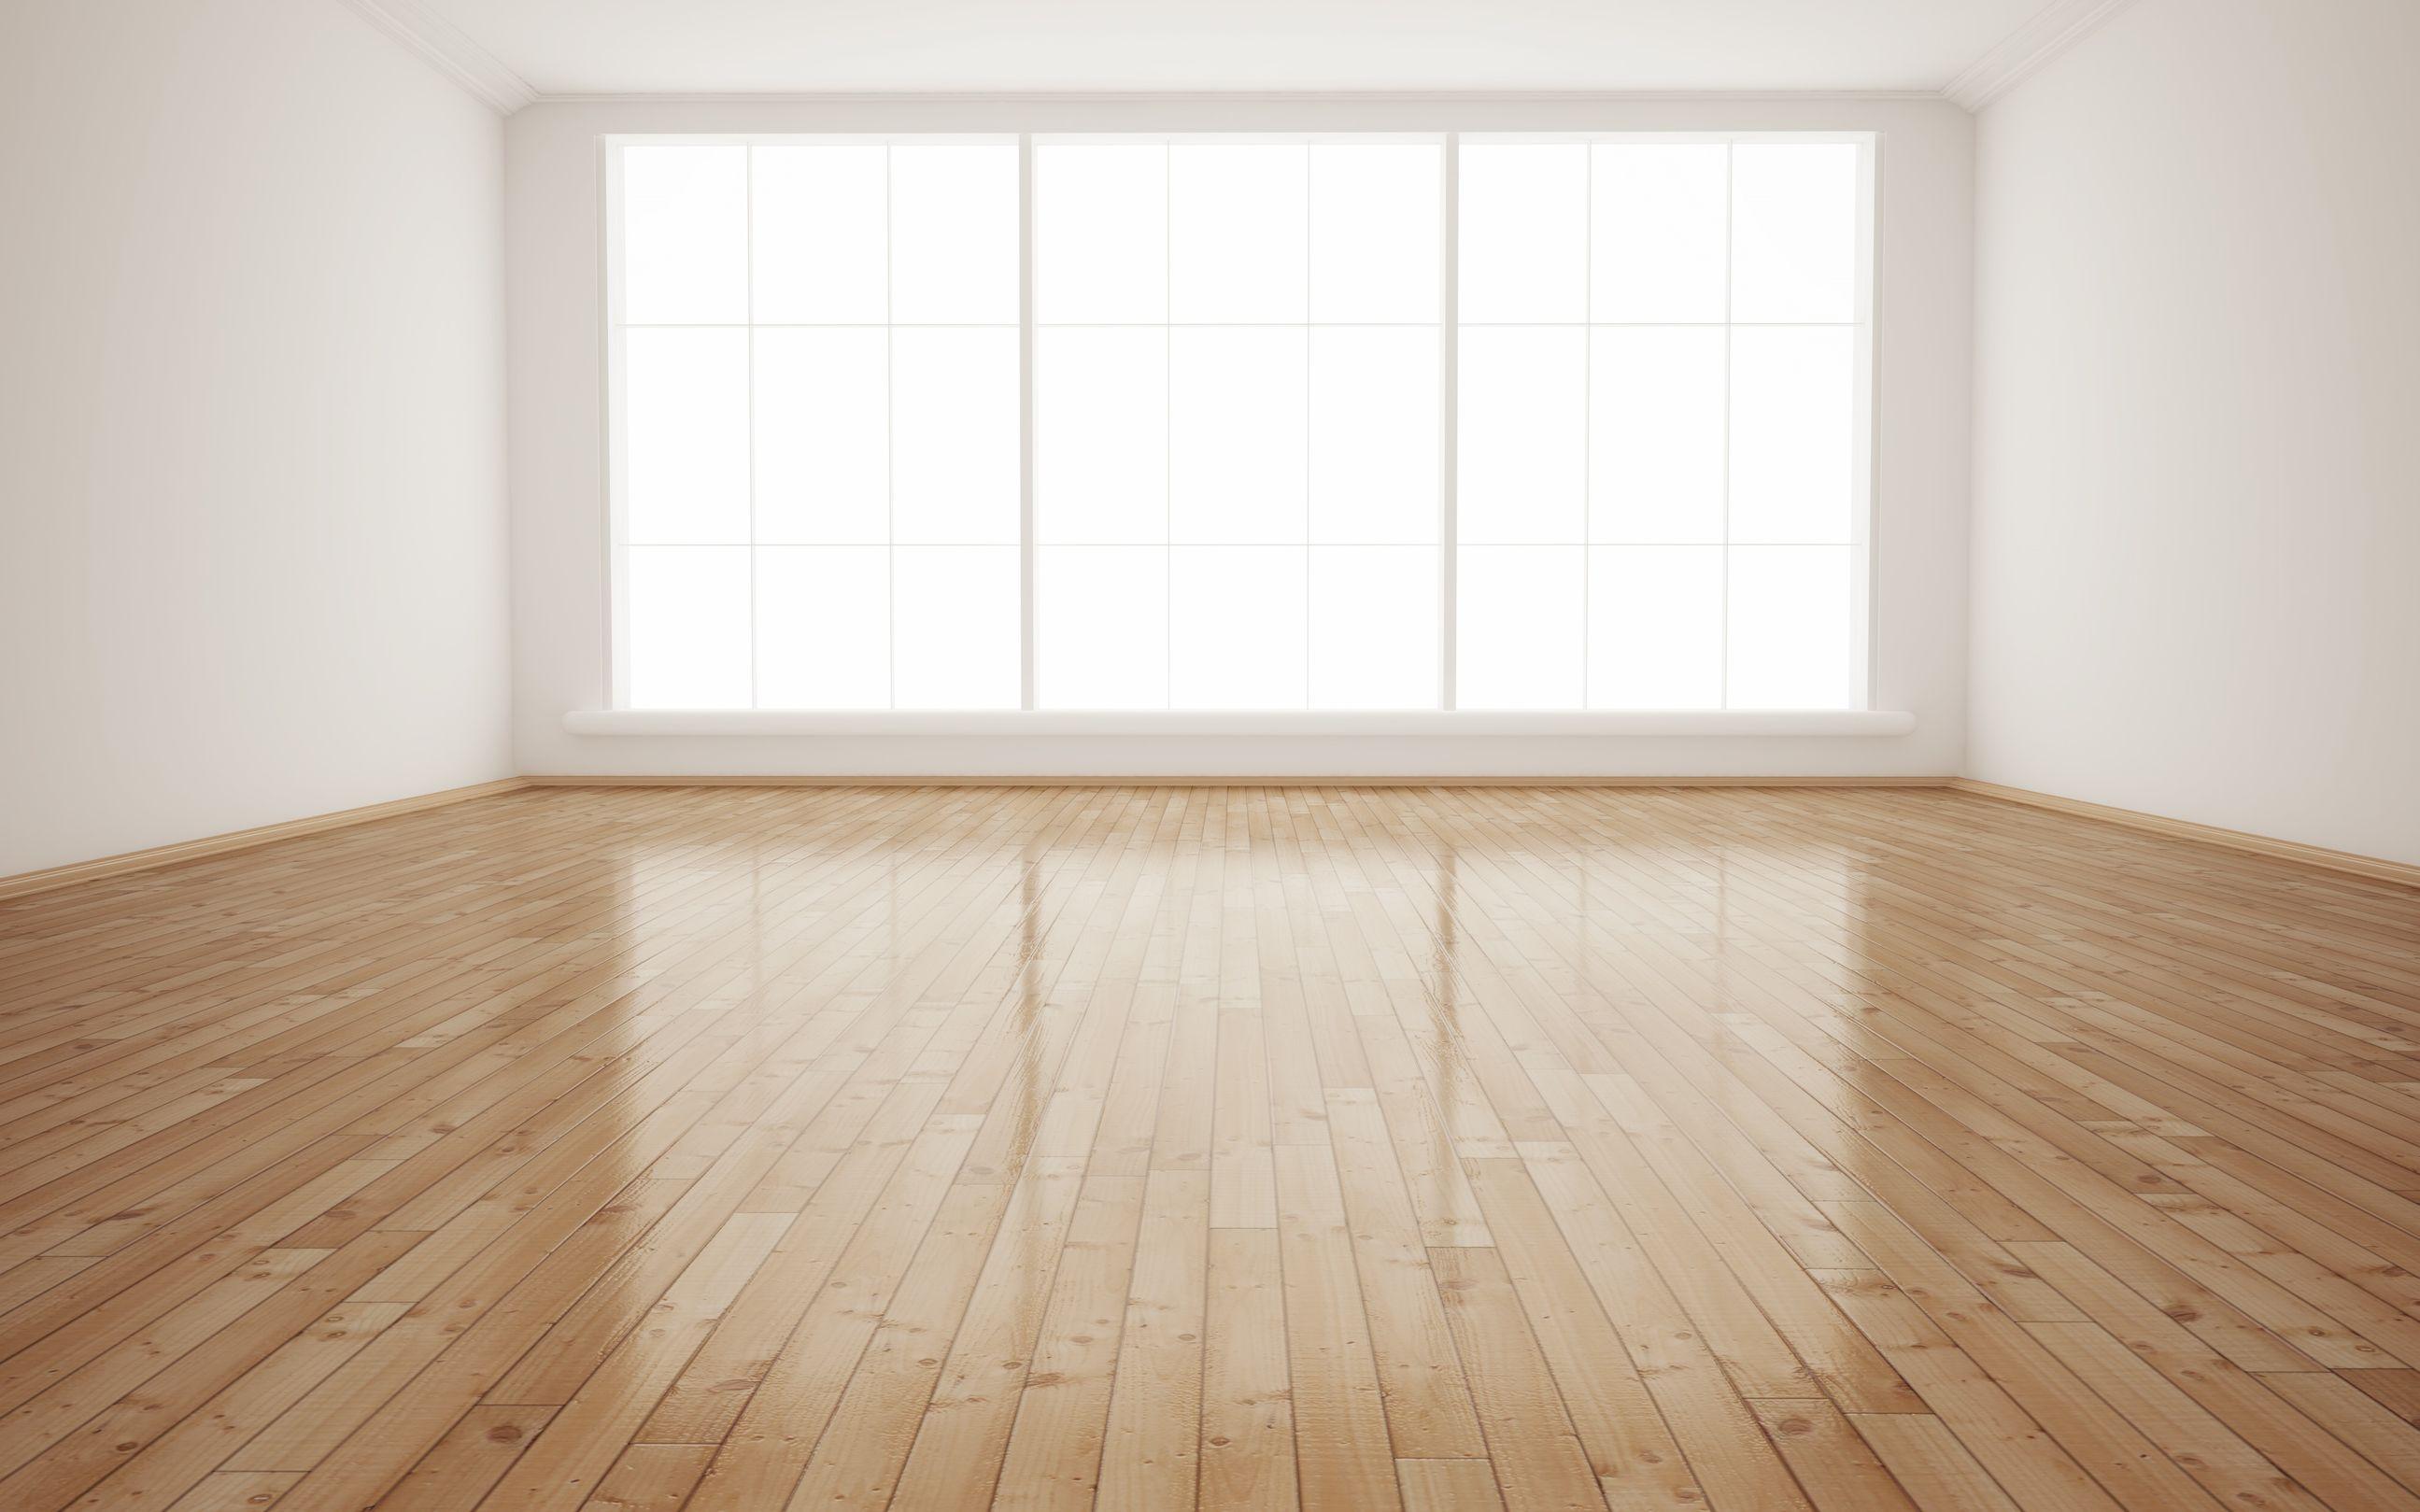 Bright interior empty room 3d render for New floor